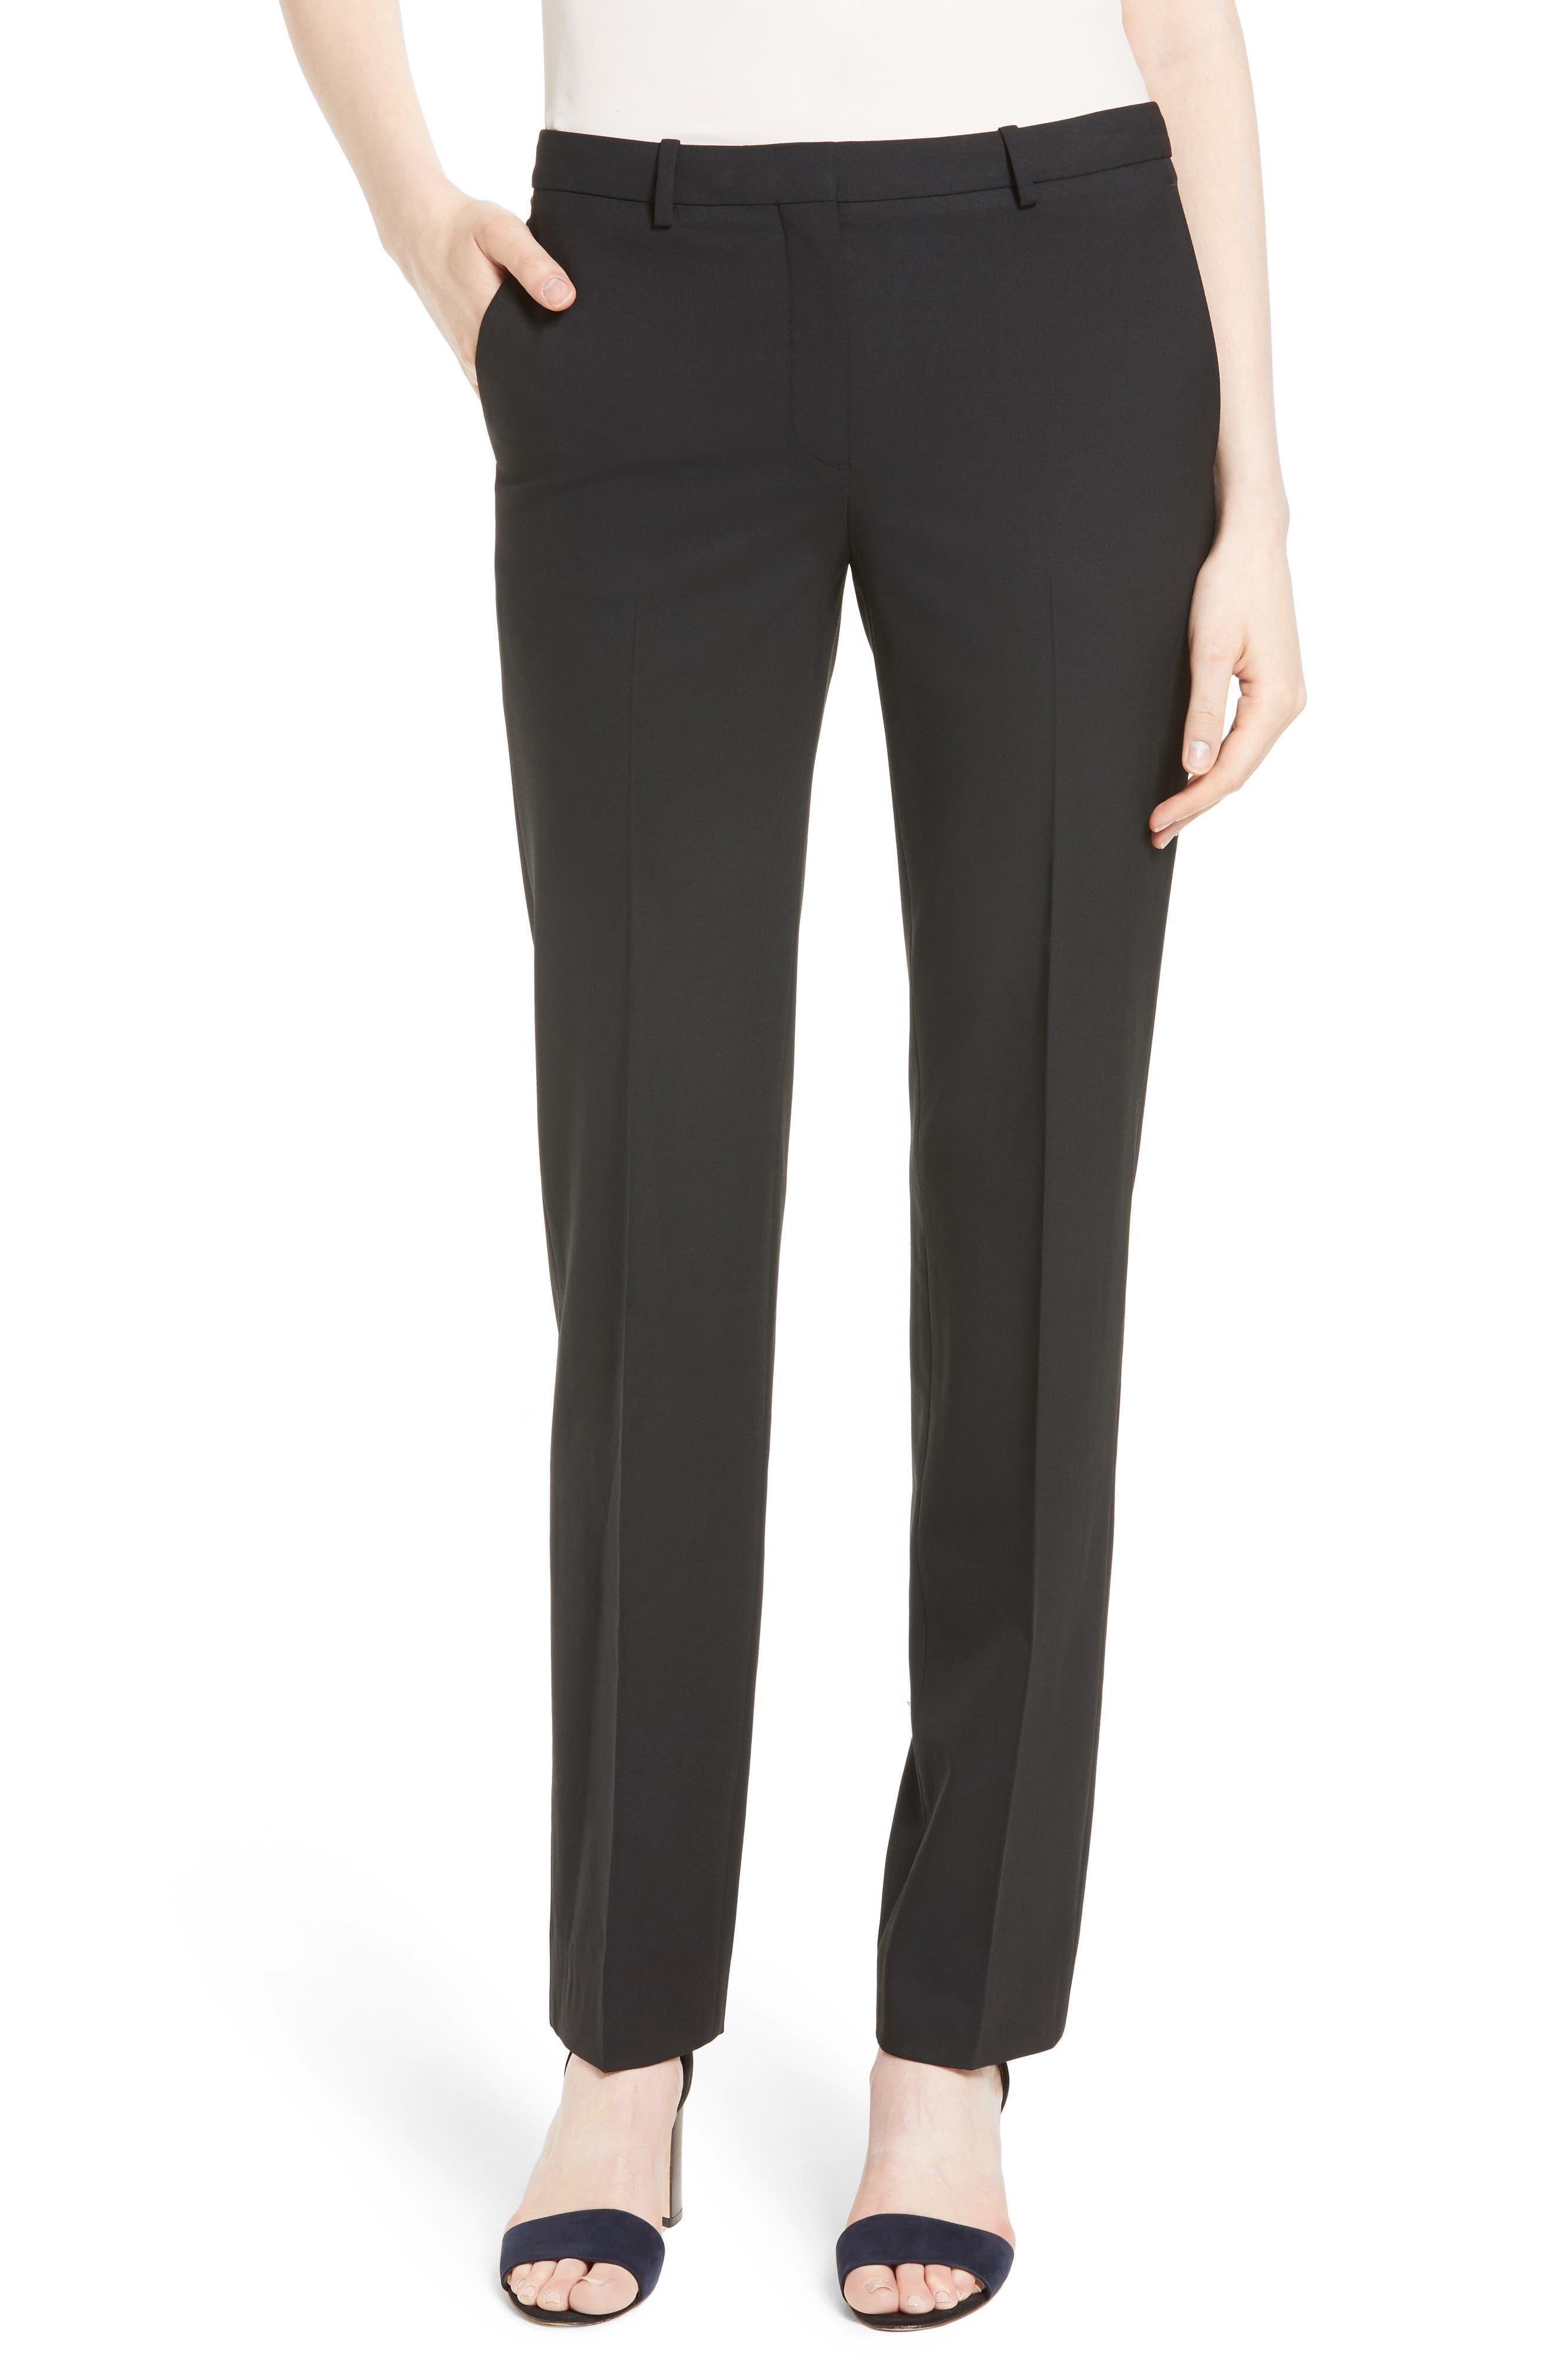 THEORY, Hartsdale B Good Wool Suit Pants, Main thumbnail 1, color, 001